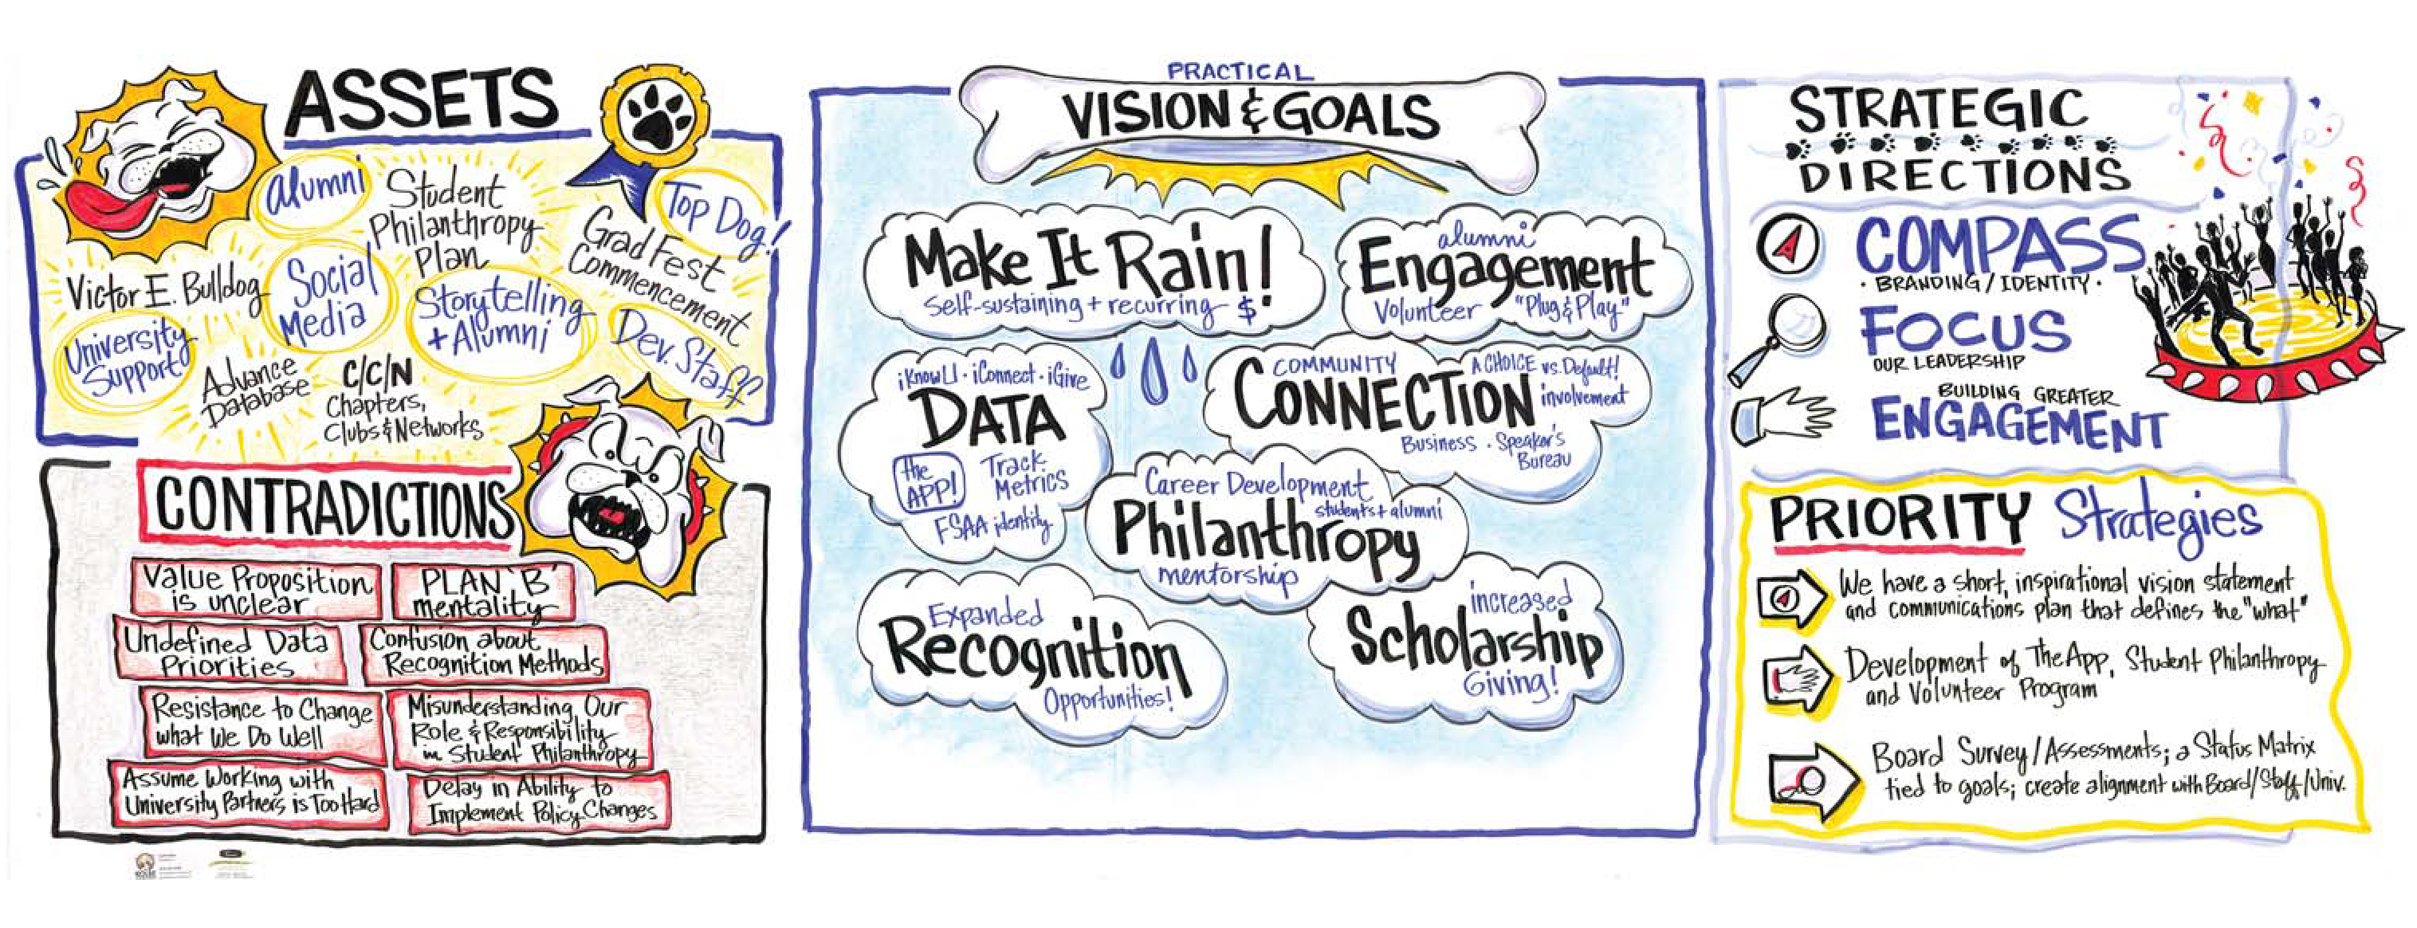 Strategic Plan Capture for Alumni Association